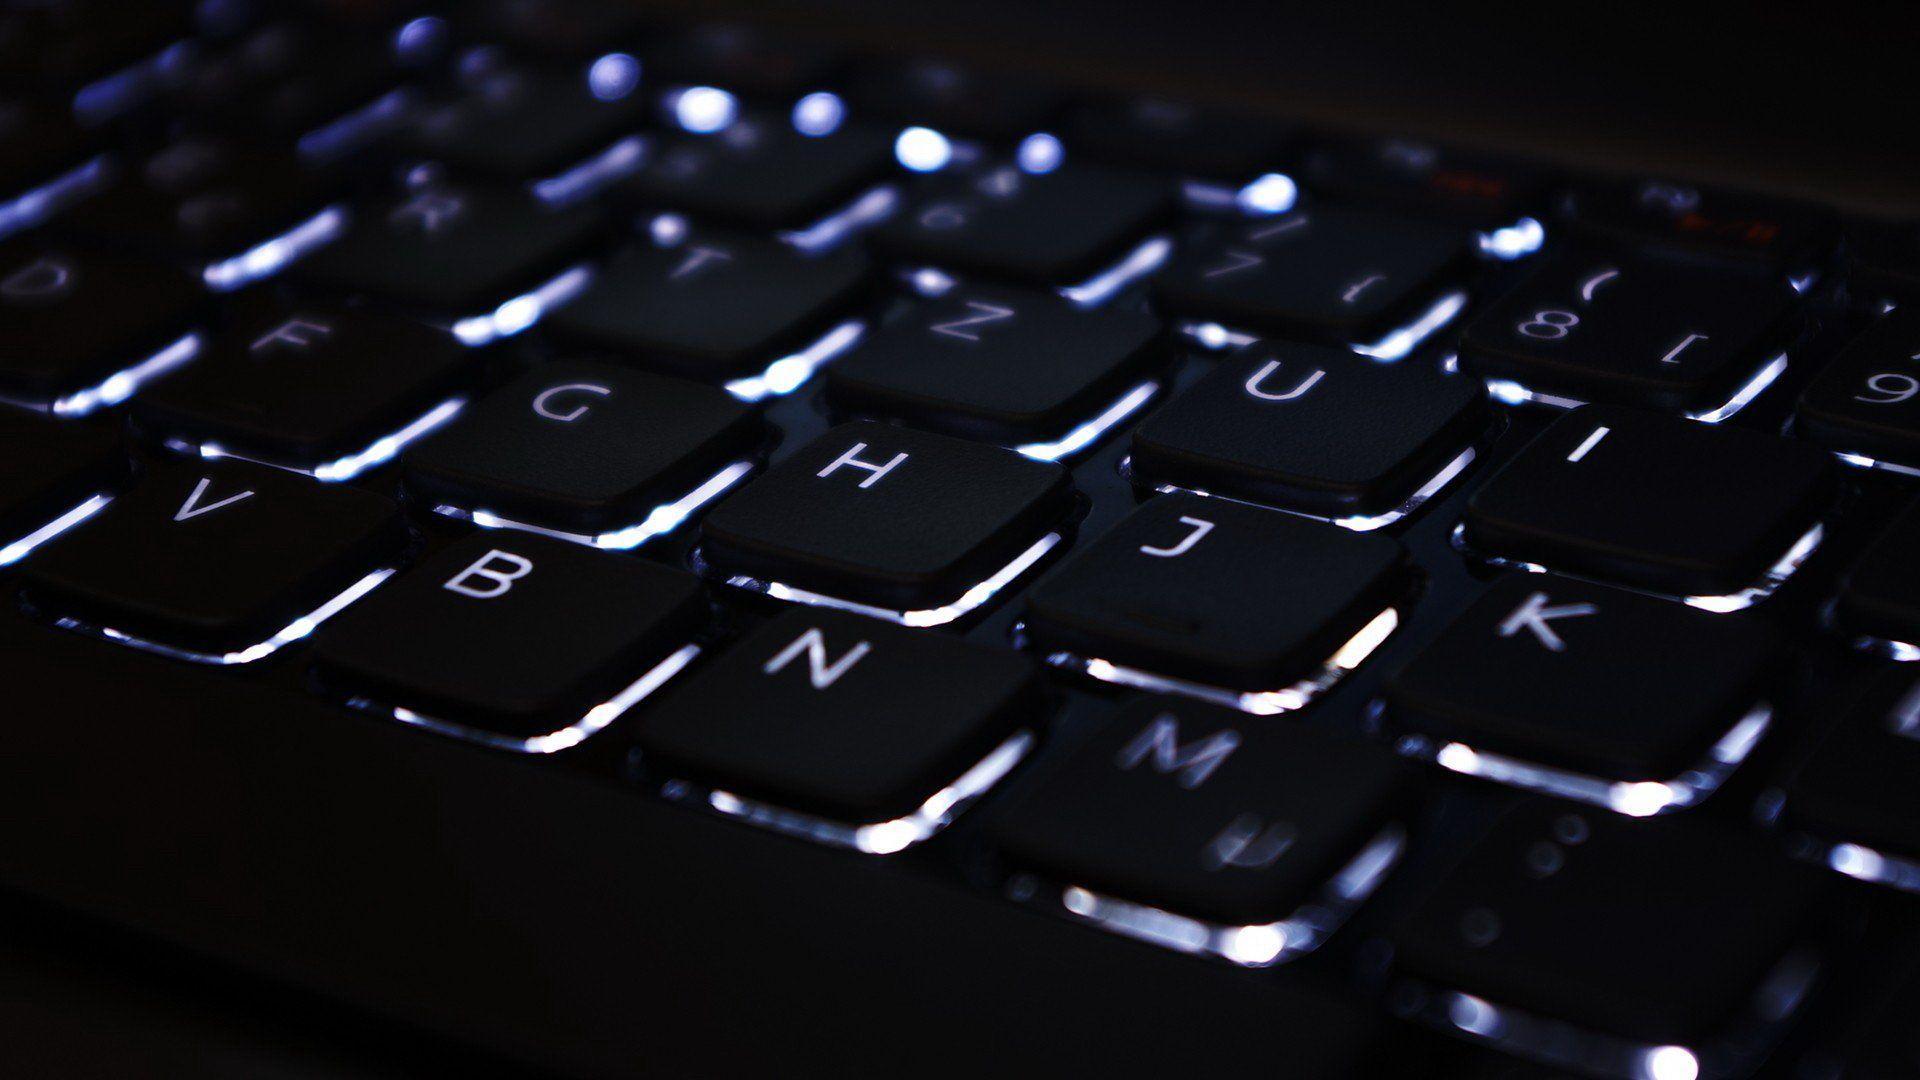 Full Hd Keyboard Wallpapers Top Free Full Hd Keyboard Backgrounds Wallpaperaccess